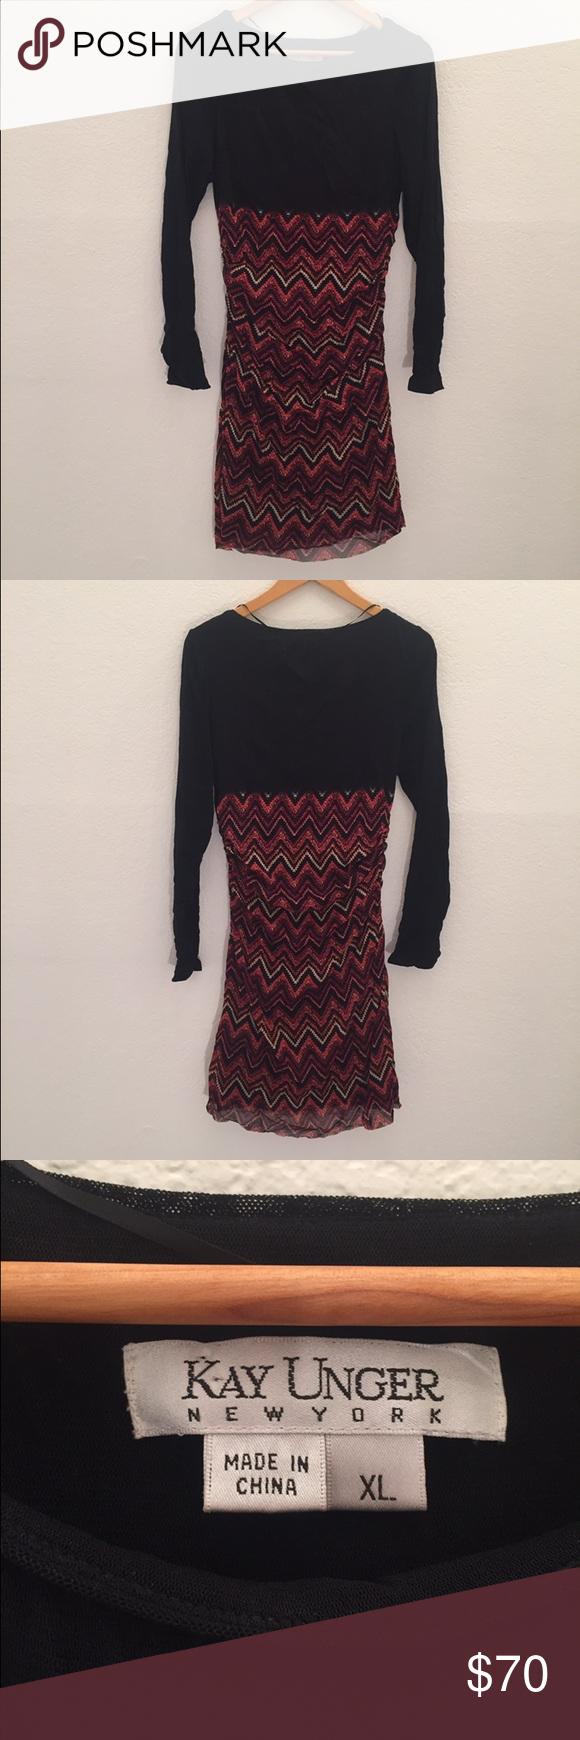 Kay unger long sleeve dress Chevron print nylon dress! Fall ready 🍂 Kay Unger Dresses Long Sleeve